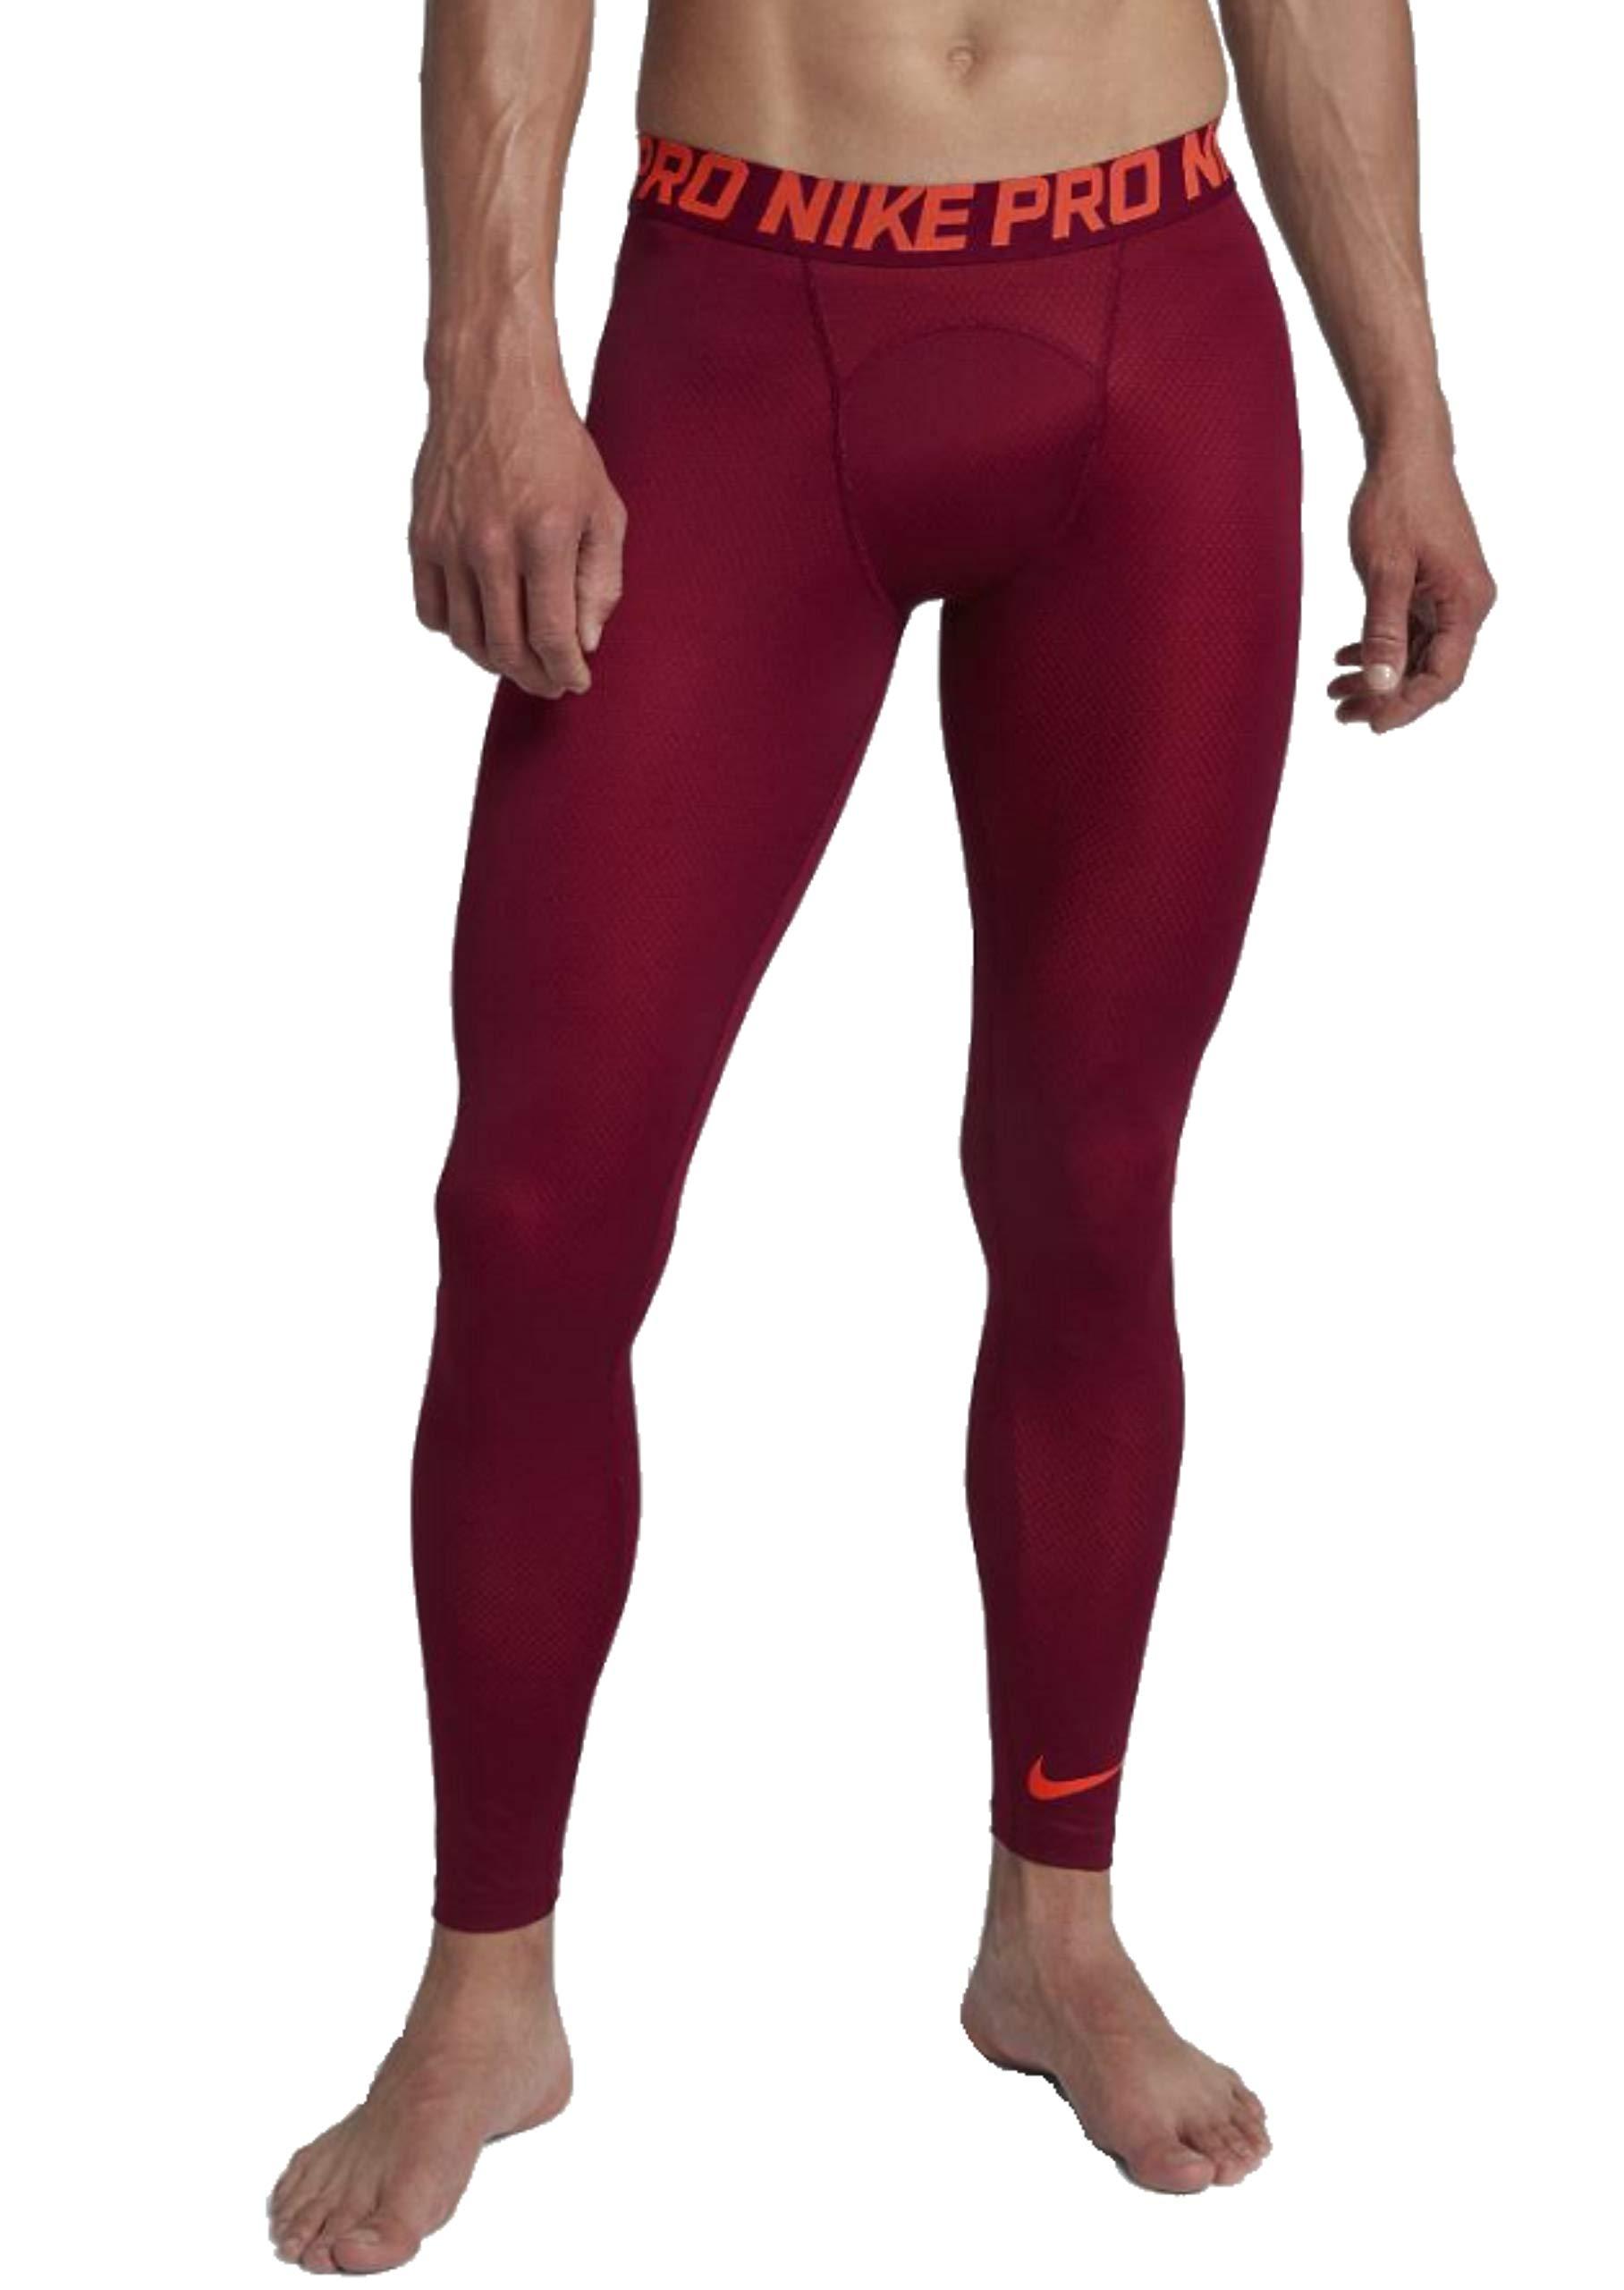 Nike Men's Pro Tights (Large, Crimson Orange/Marron)